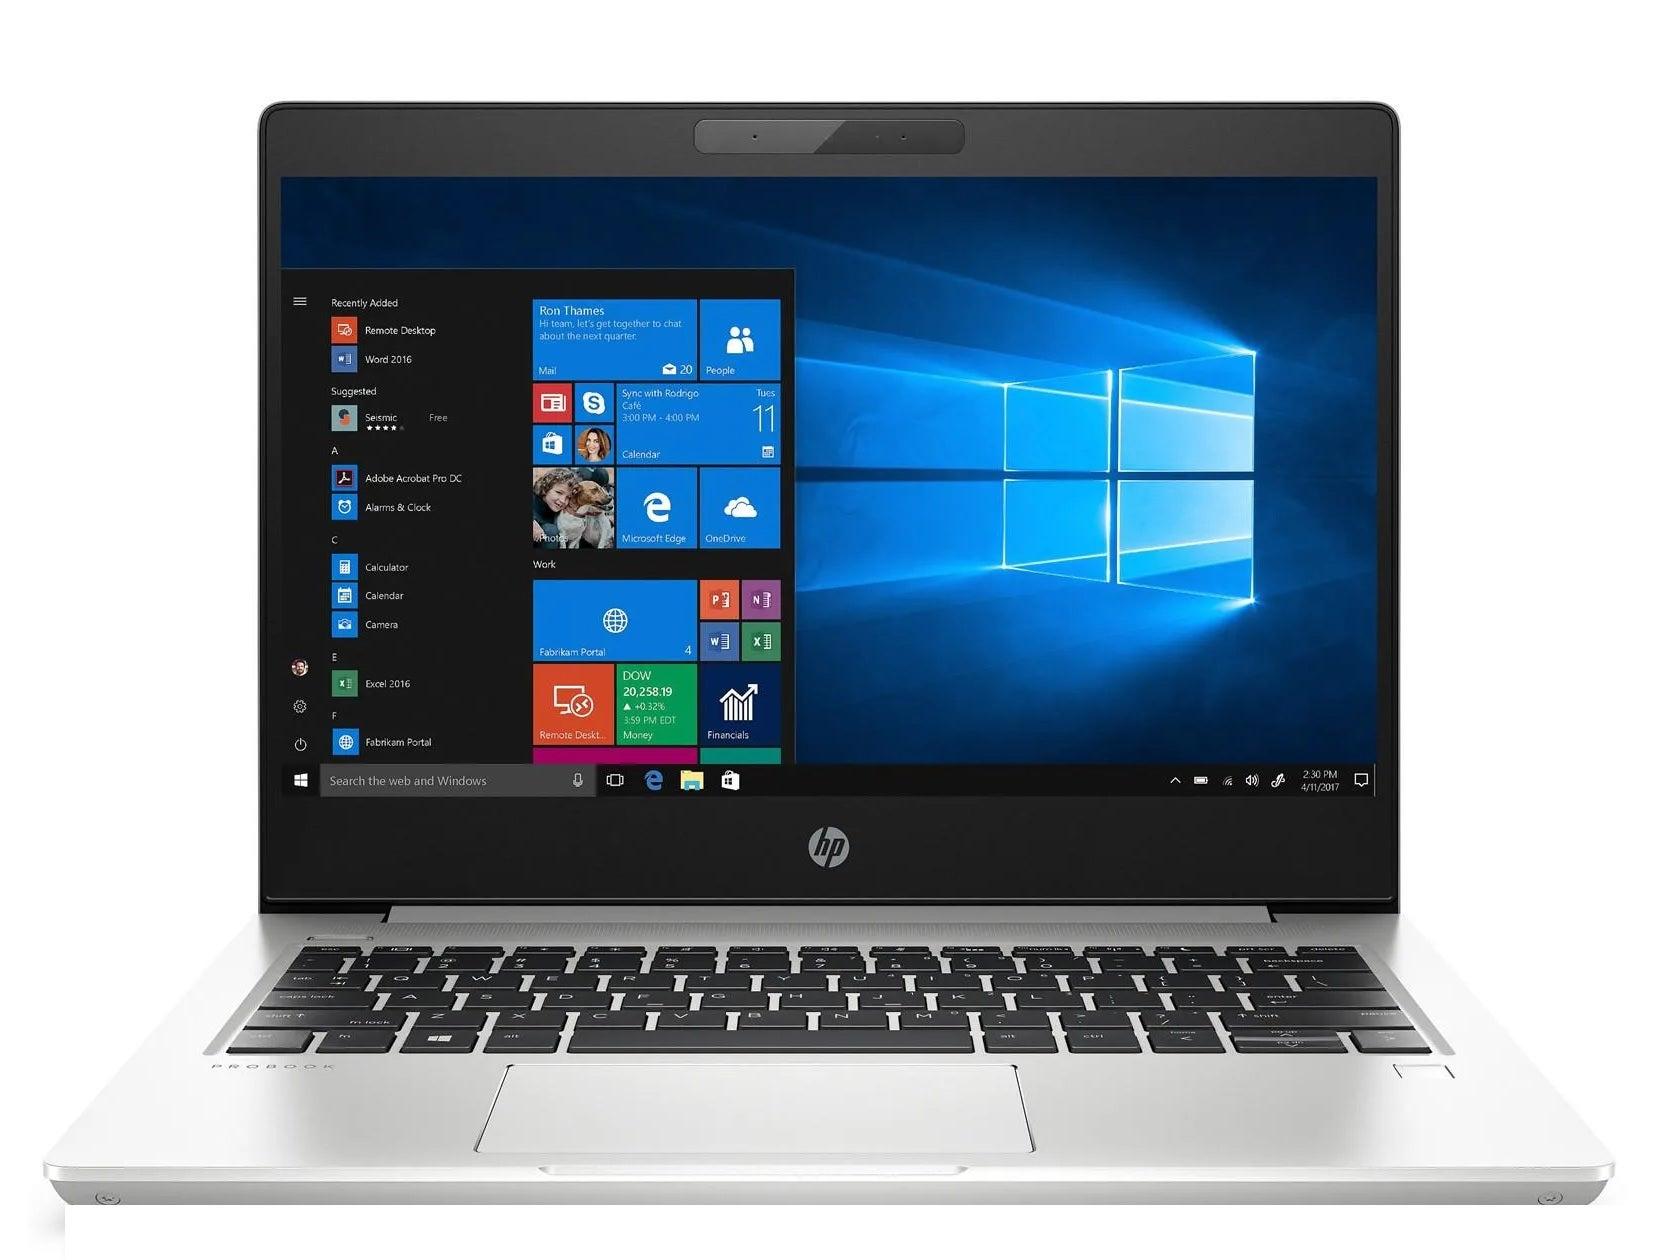 HP Probook 430 G7 13 inch Laptop